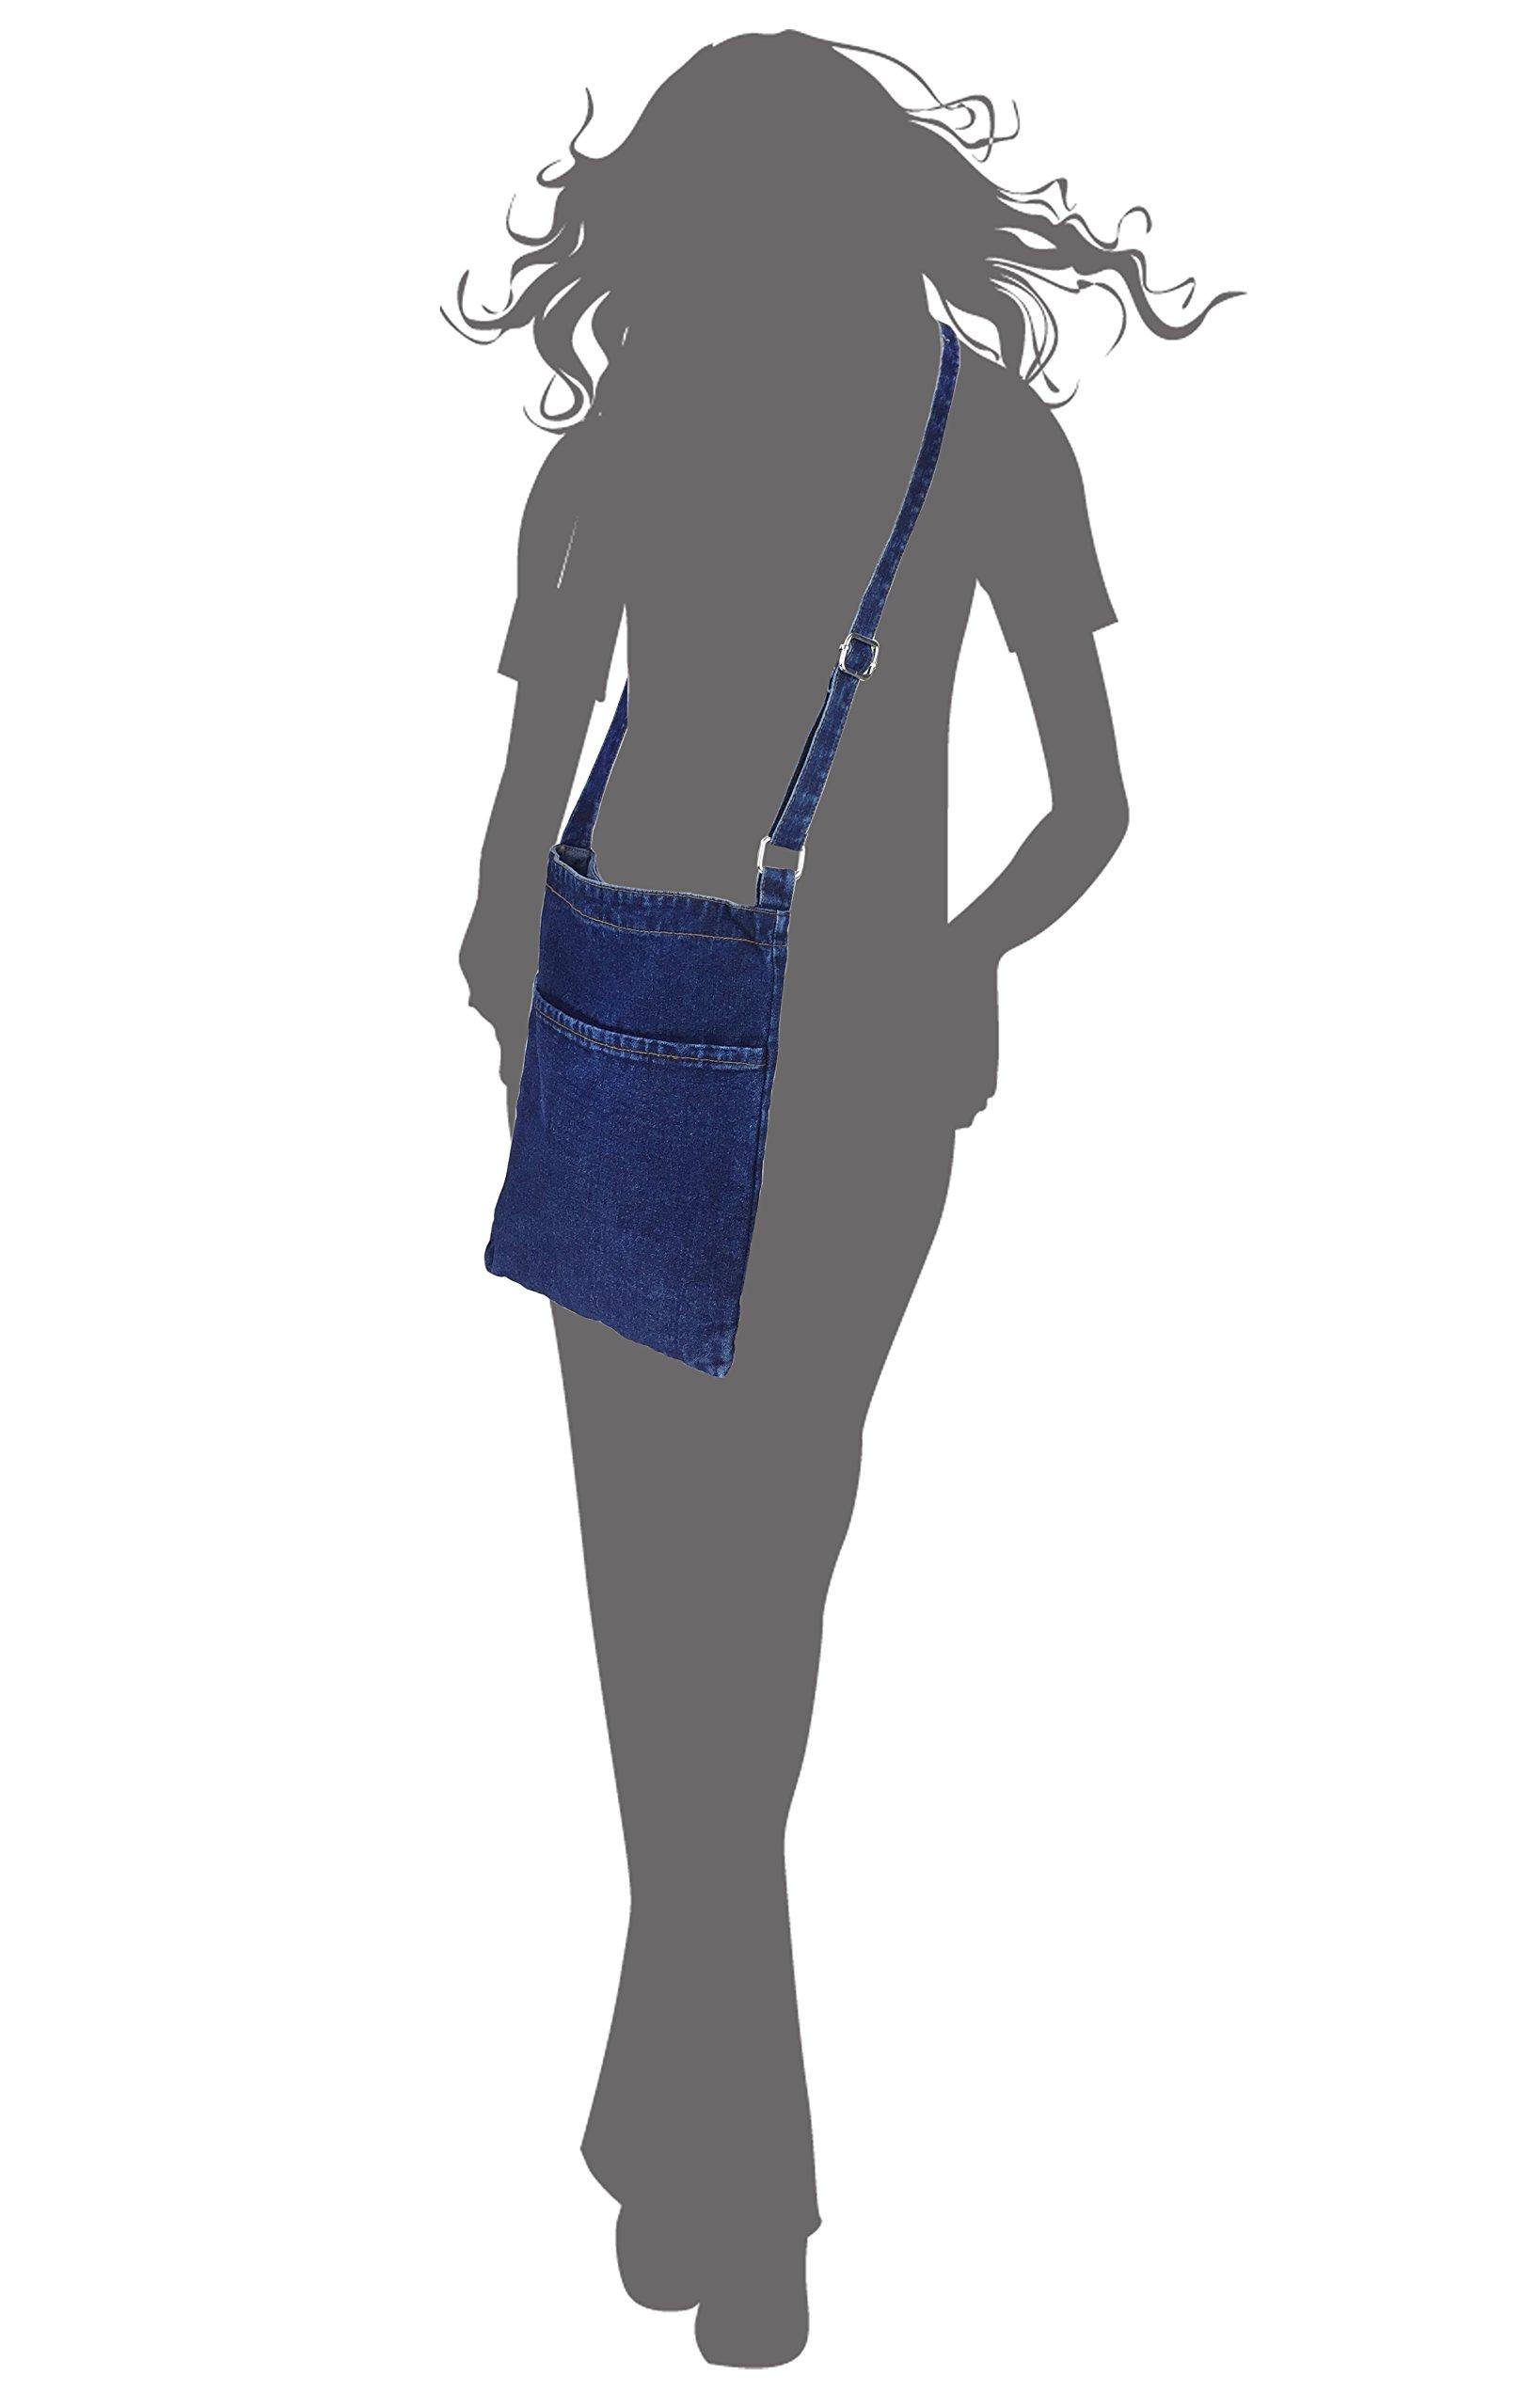 6642e274b8f6 Hoxis Portable Travel Two Pocket Soft Denim Cross Body Womens Shoulder Bag  Pouch